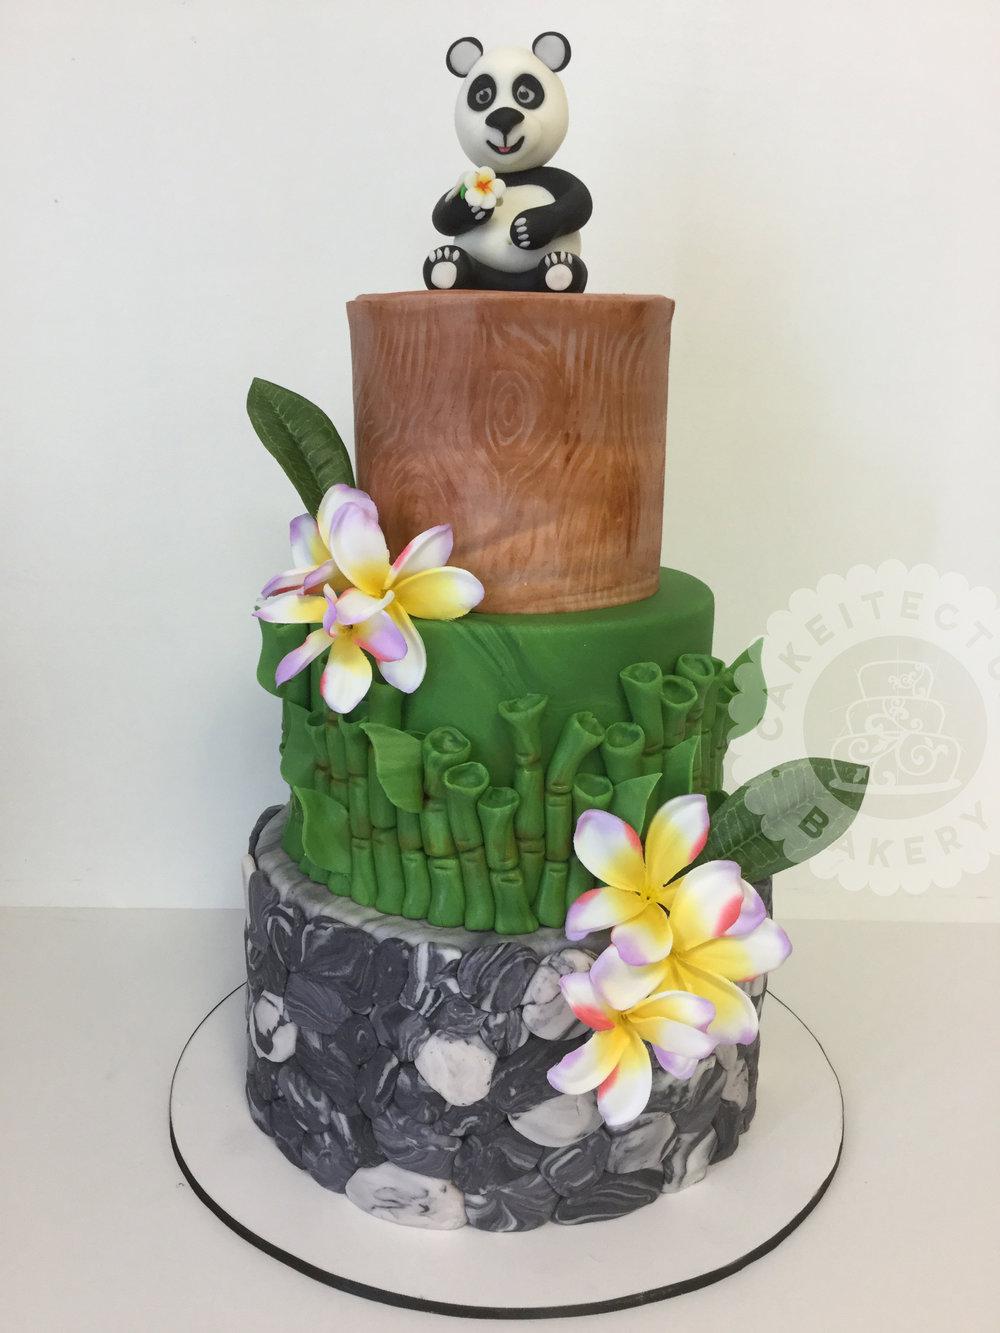 Cakeitecture Bakery 1719 panda cake.jpg